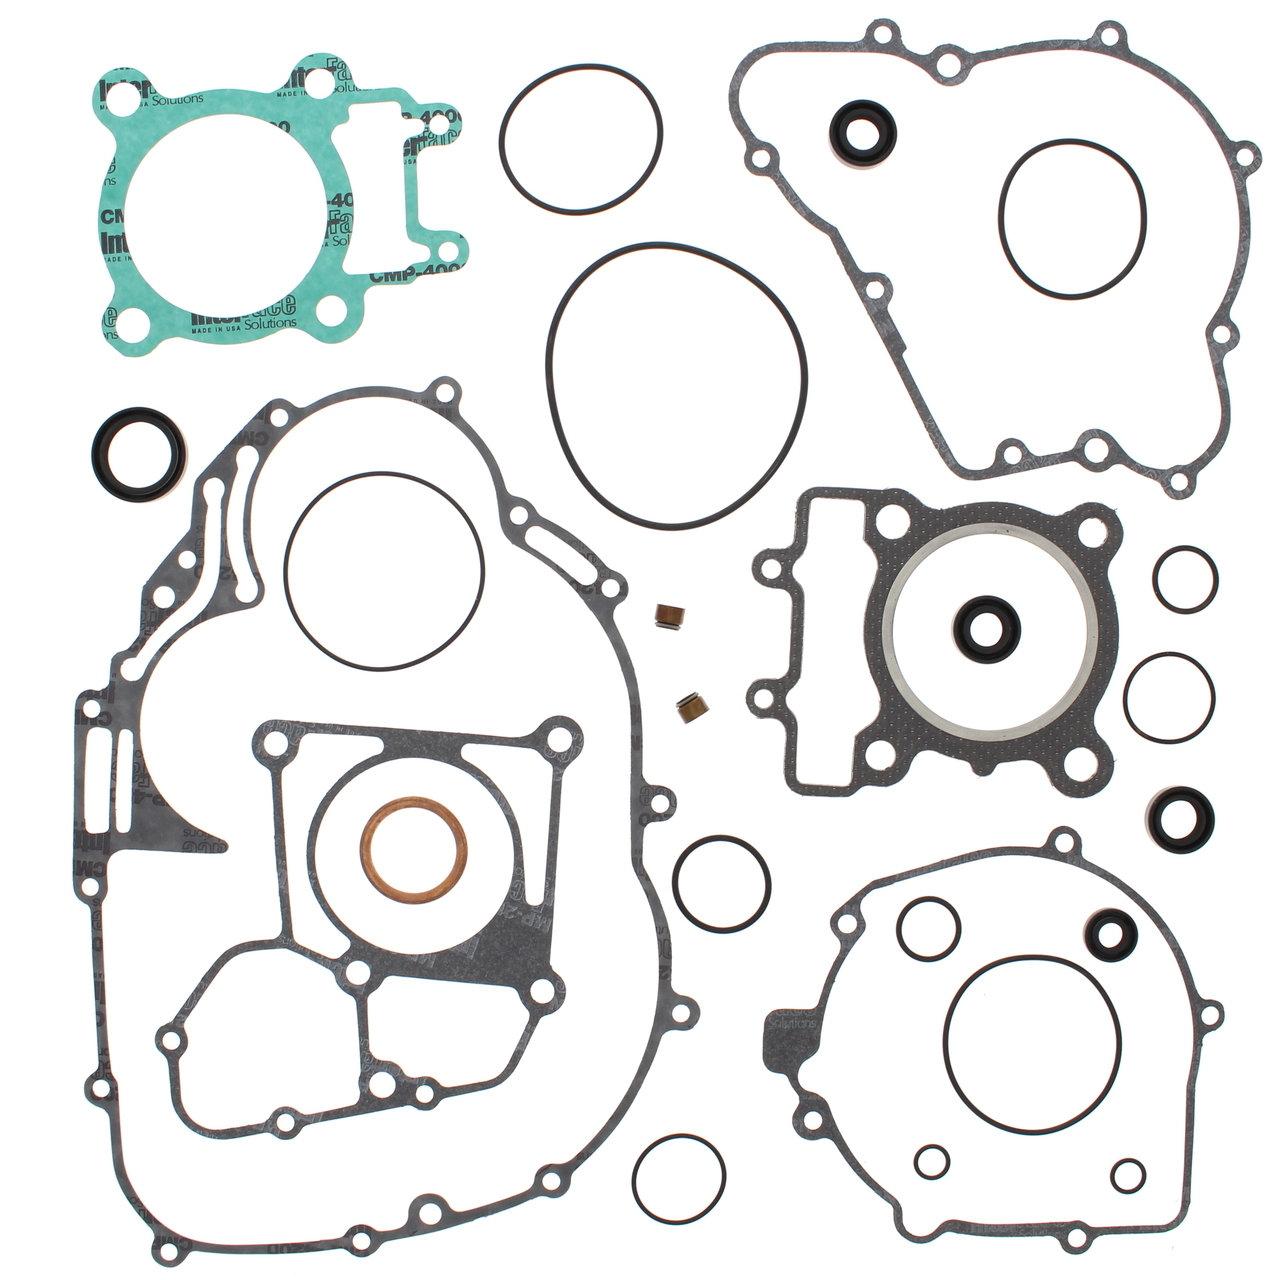 Complete Gasket Kit W Oil Seals Kawasaki Klf250 Bayou